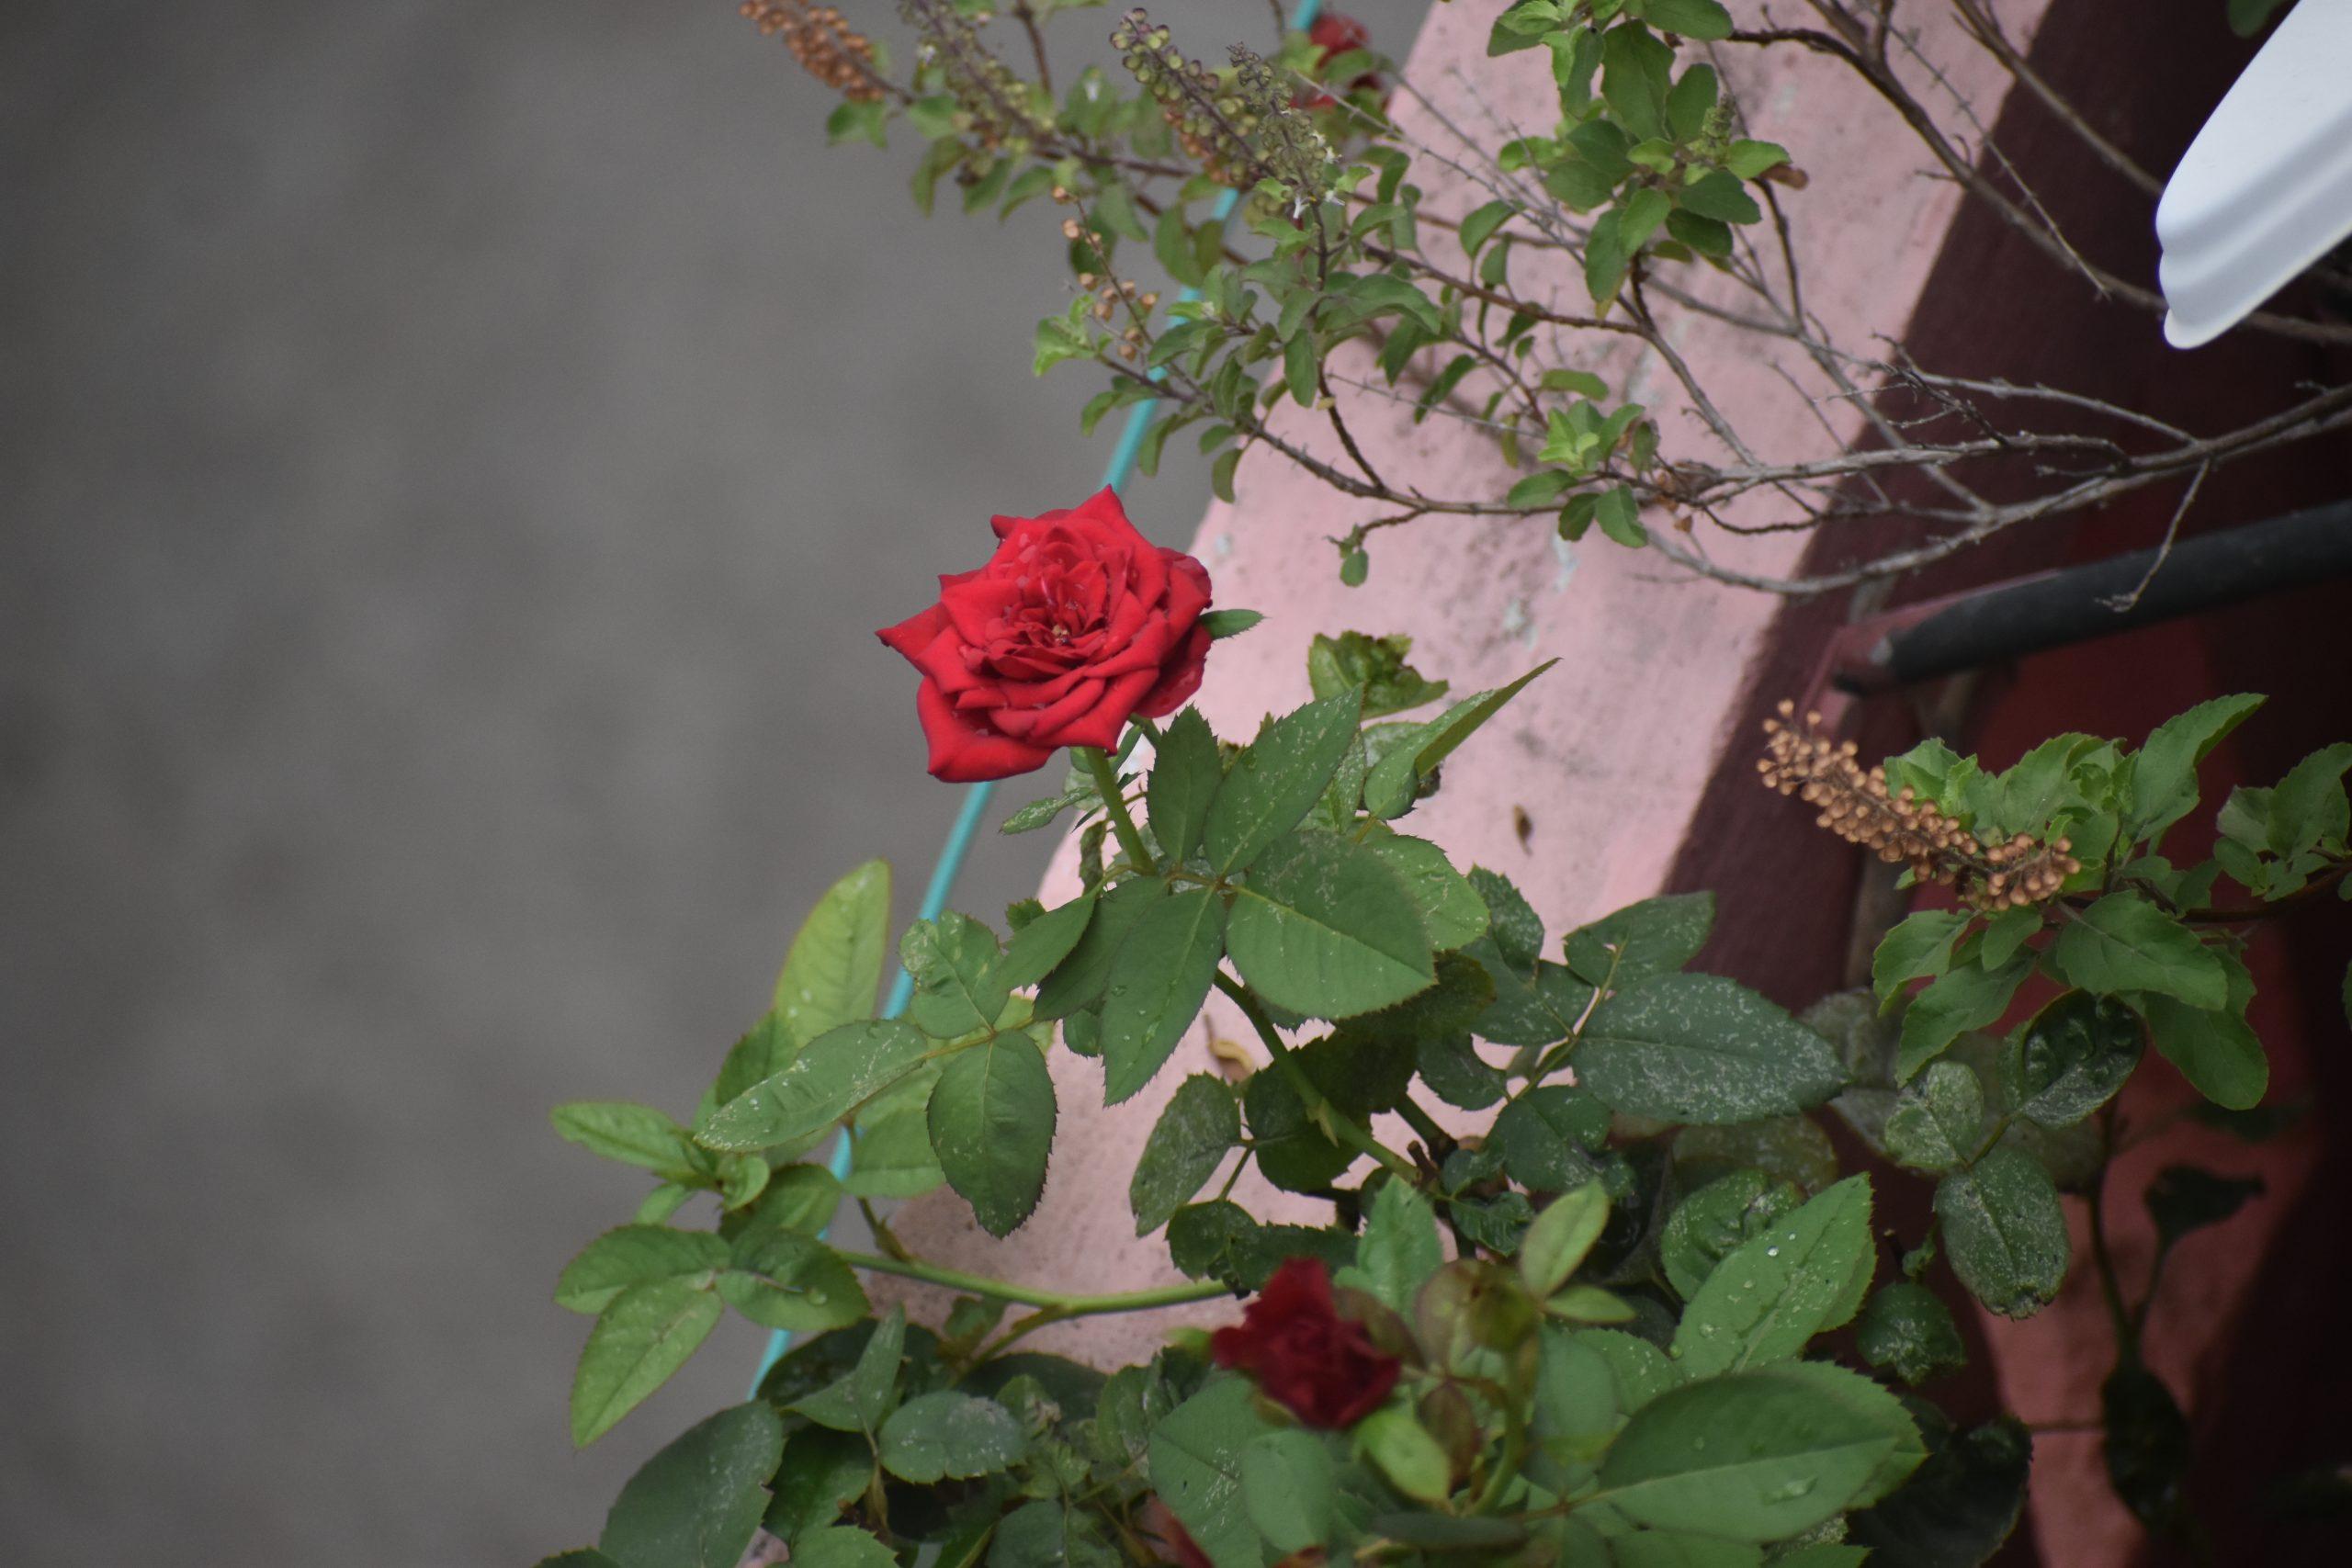 A rose plant